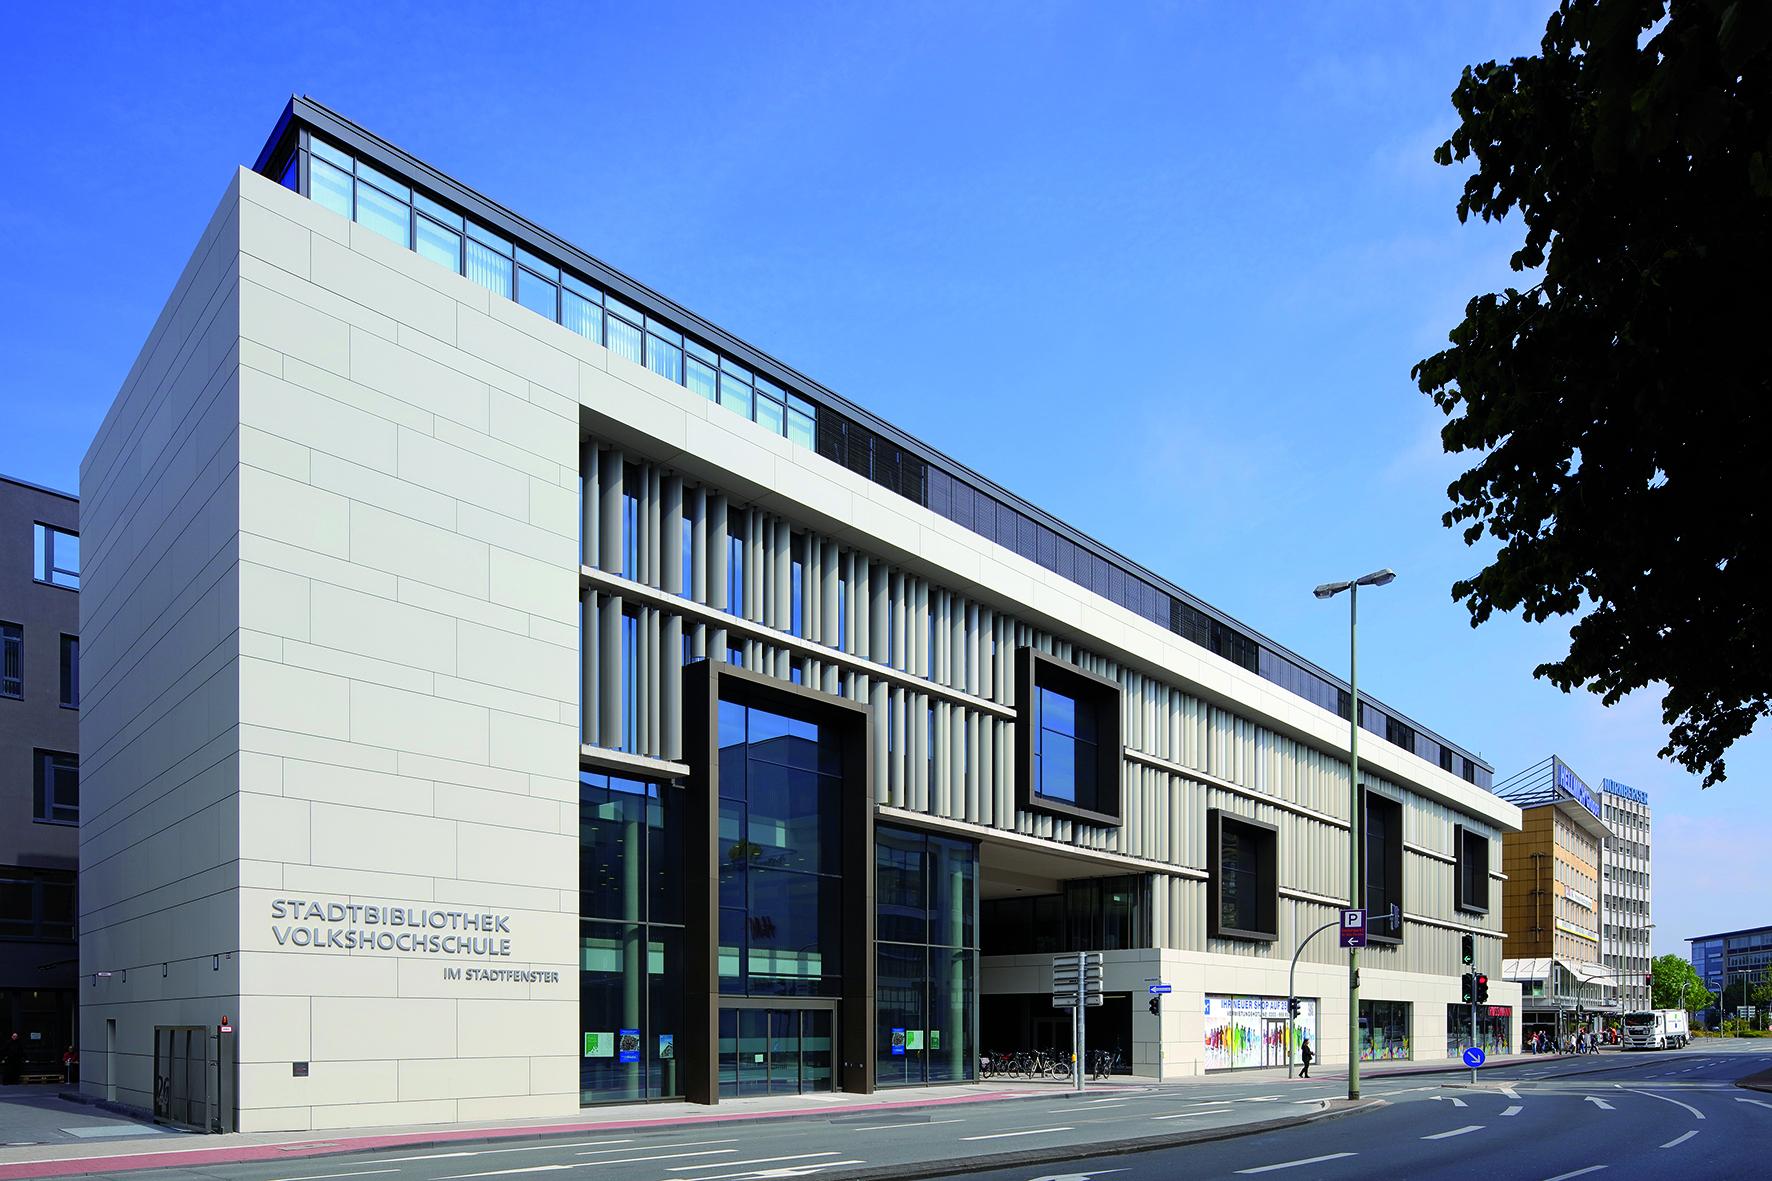 Duisburg Essen Bibliothek